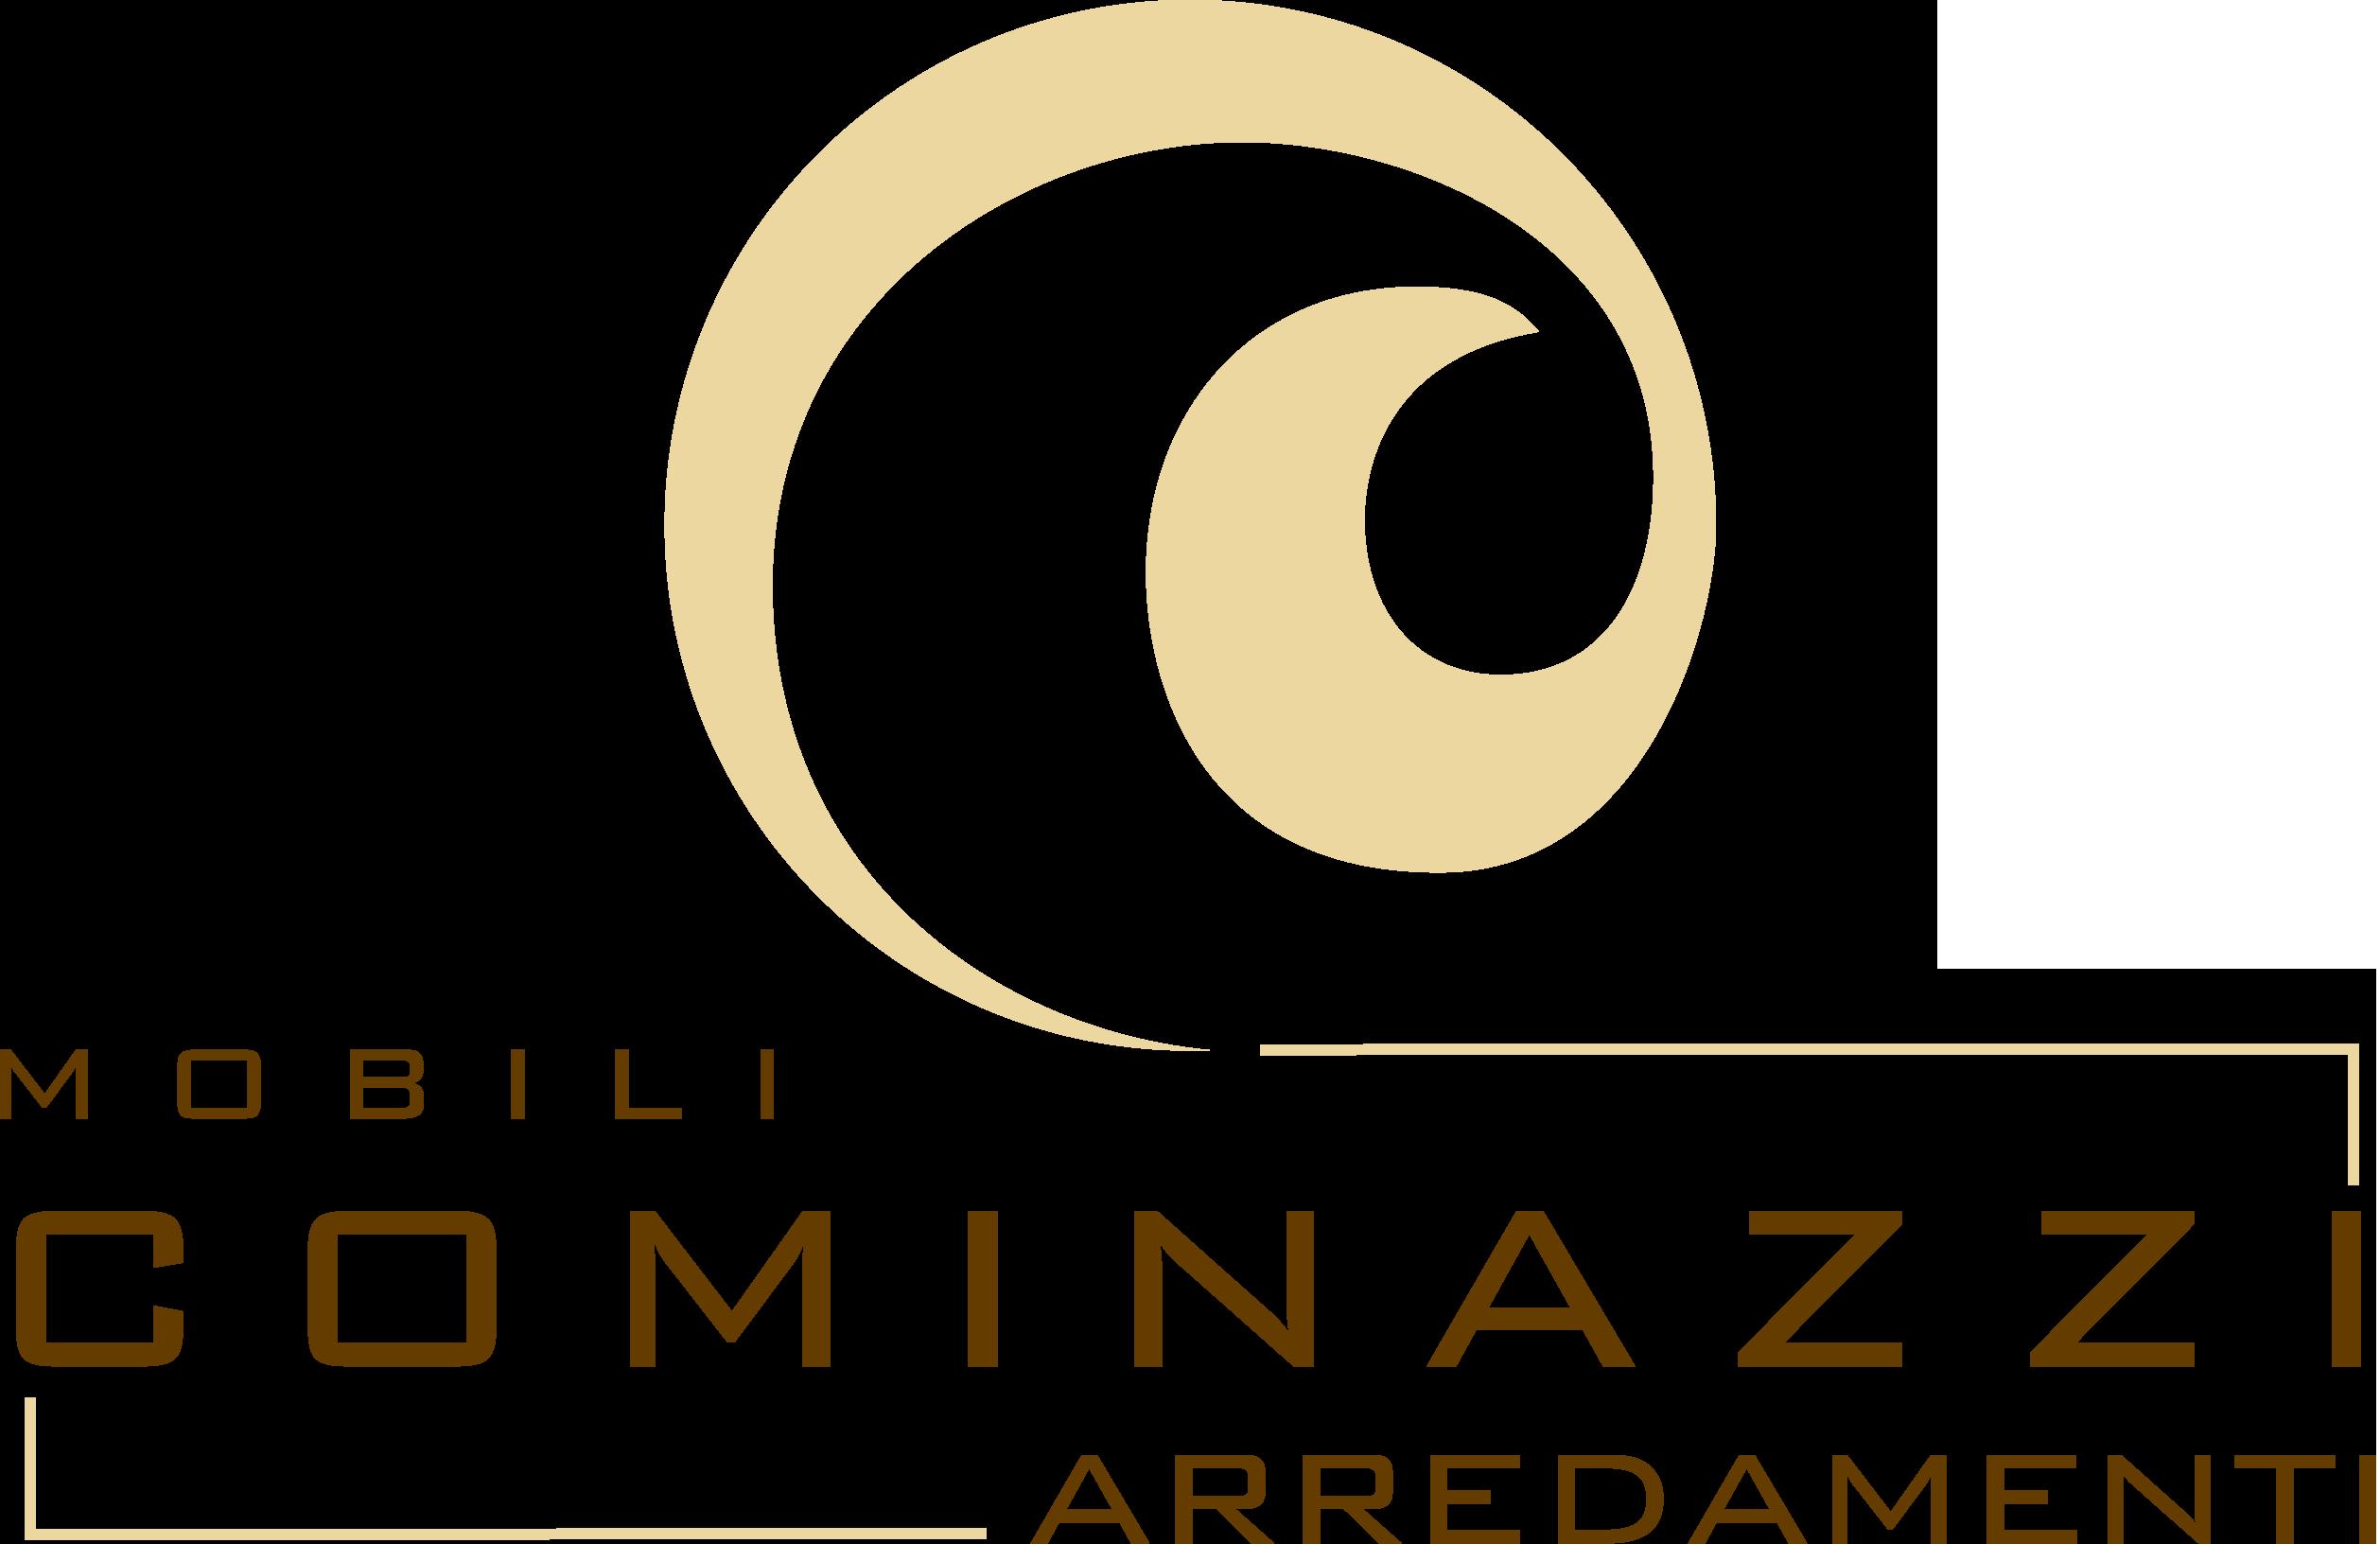 Mobili COMINAZZI